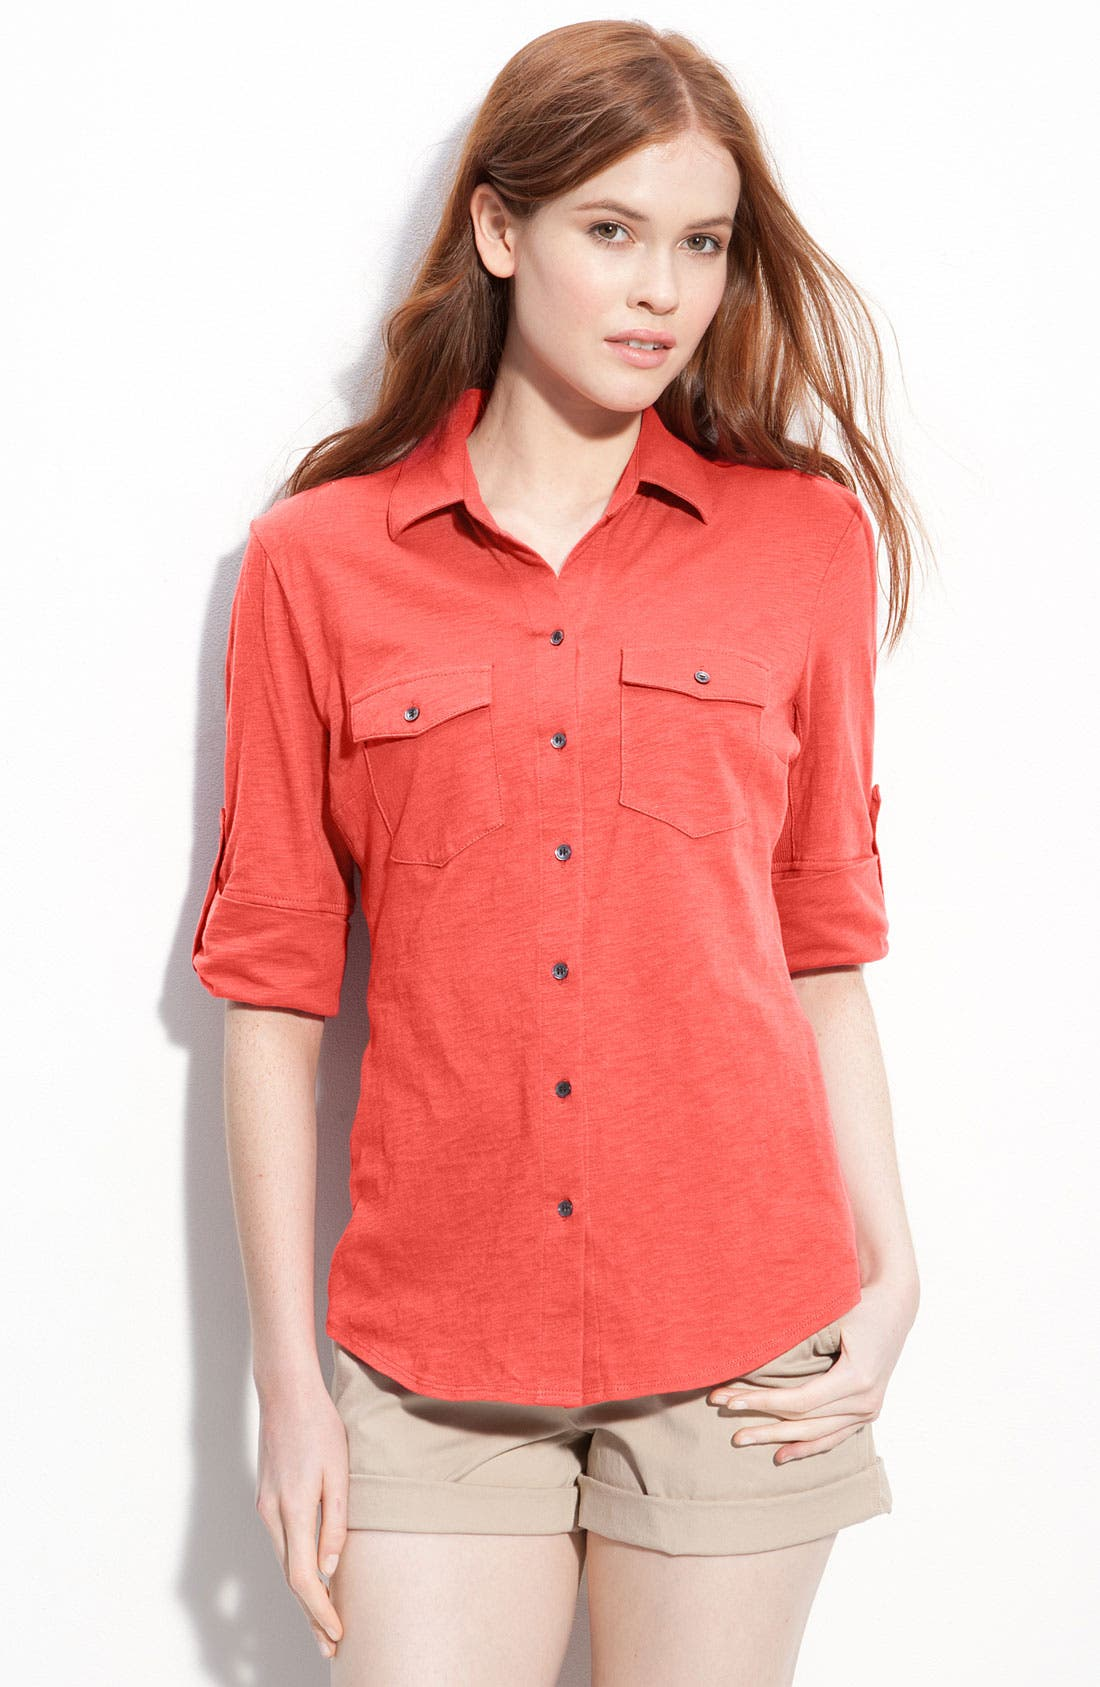 Main Image - Sandra Three Quarter Roll Sleeve Knit Shirt (Regular & Petite)